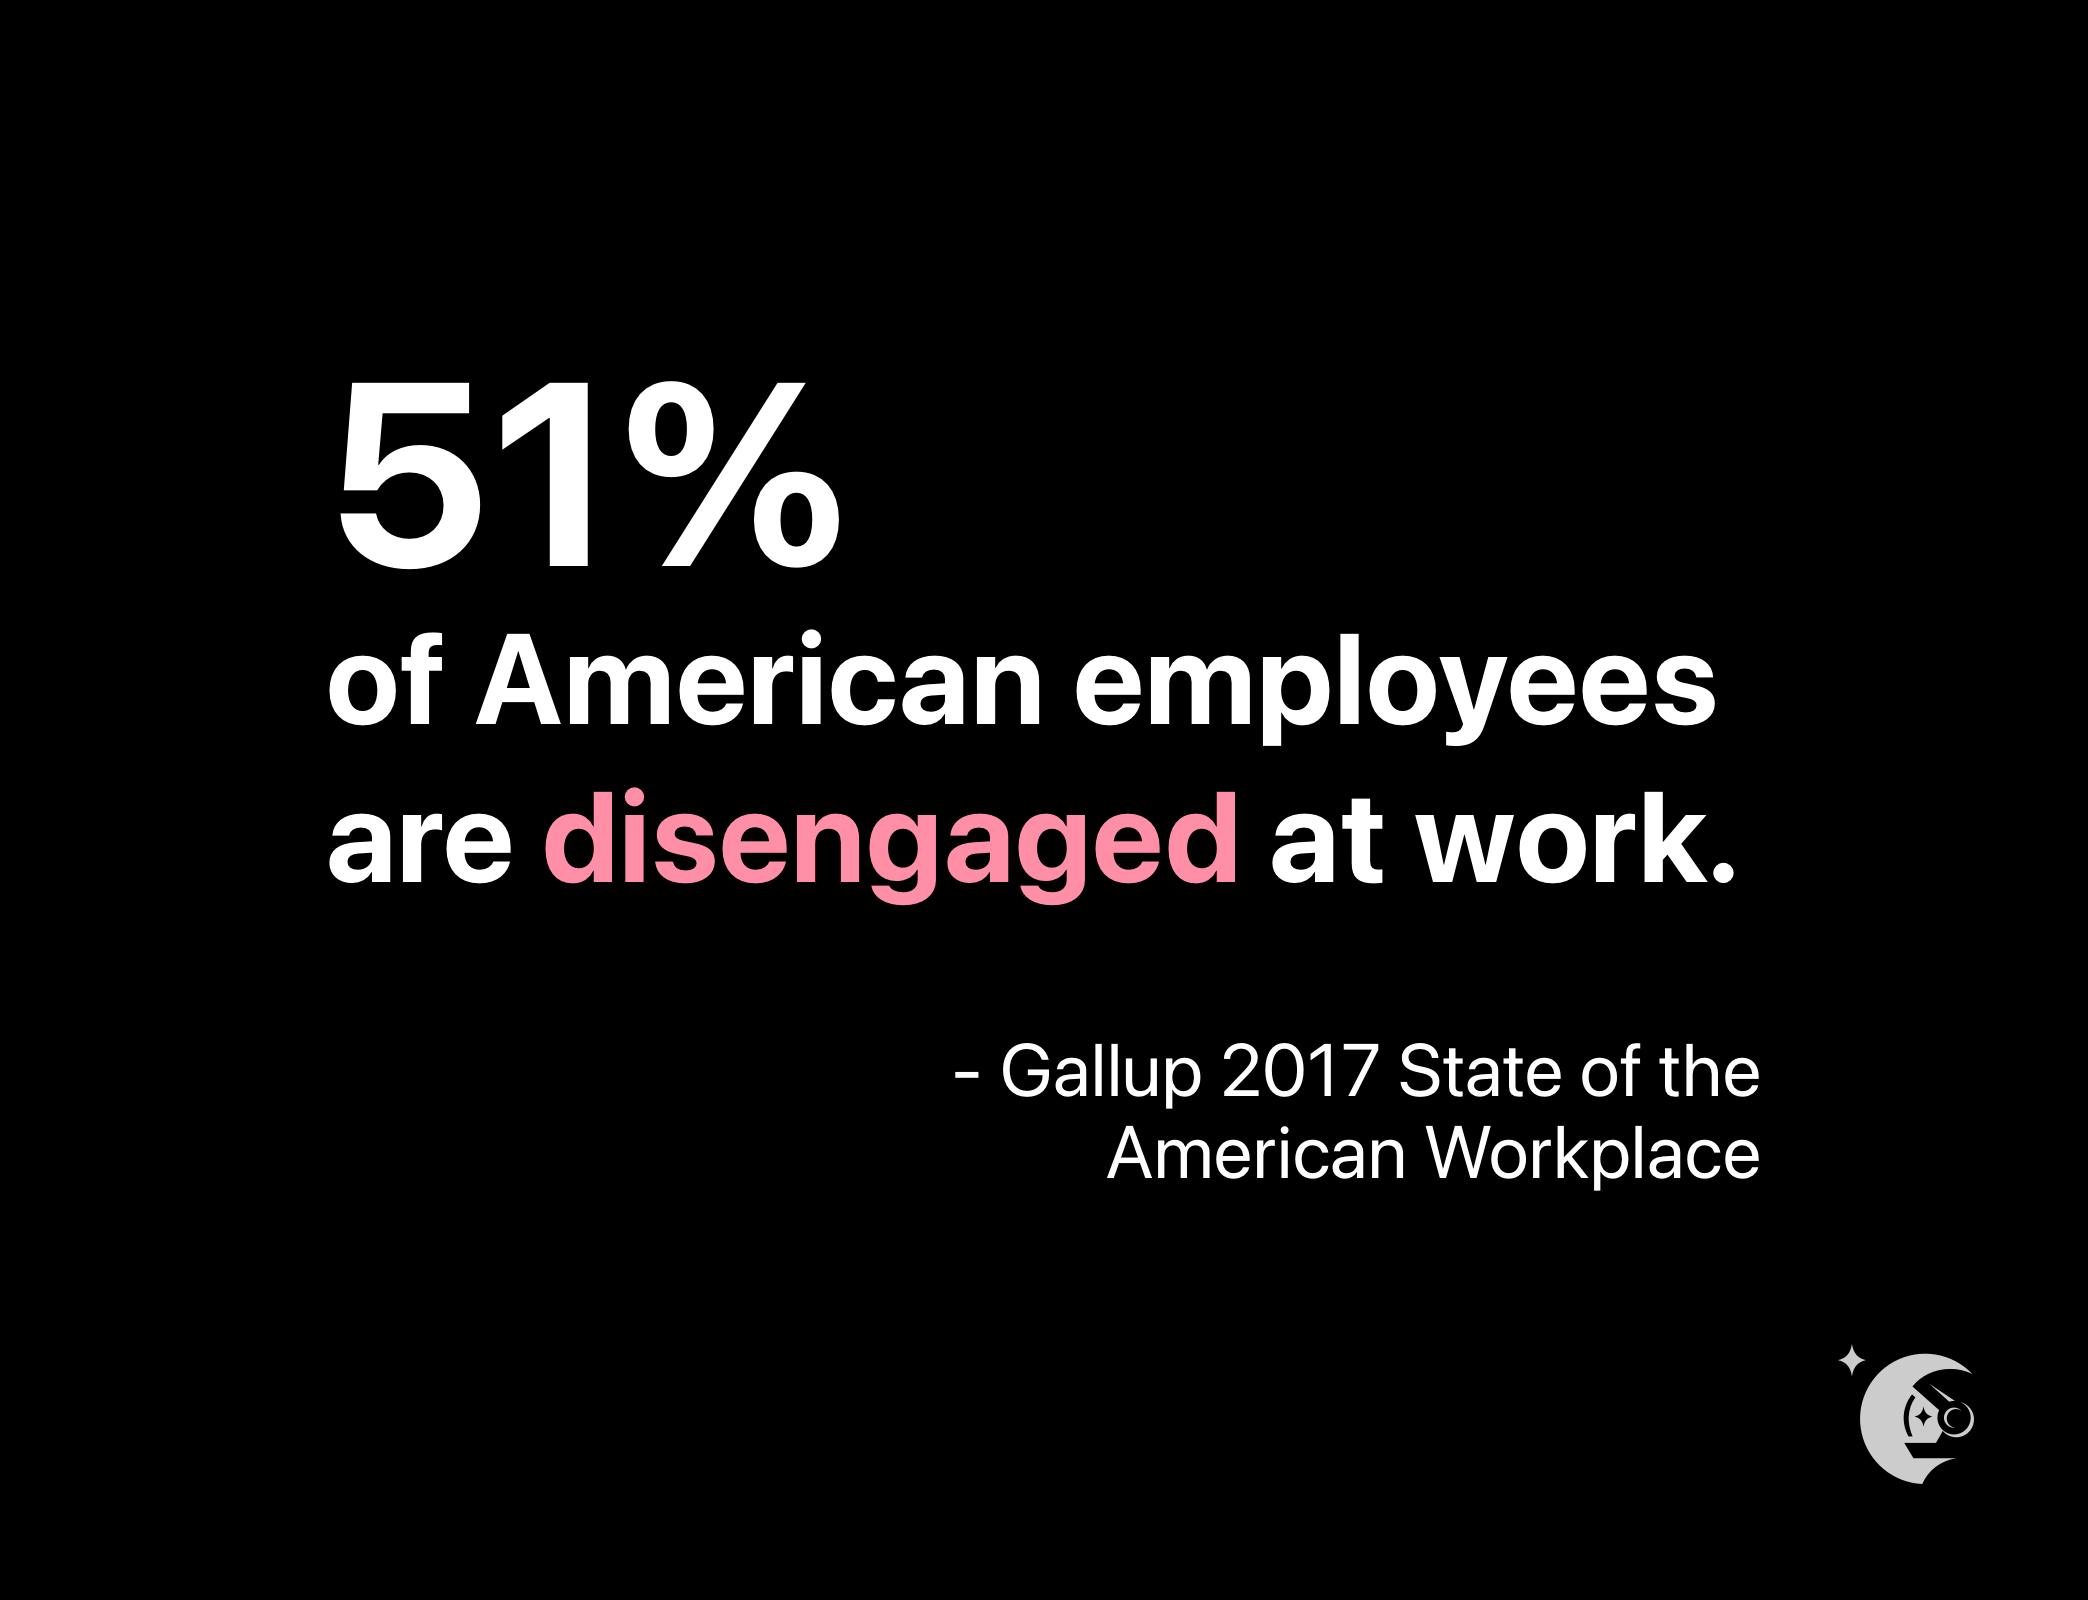 statistic on employee disengagement